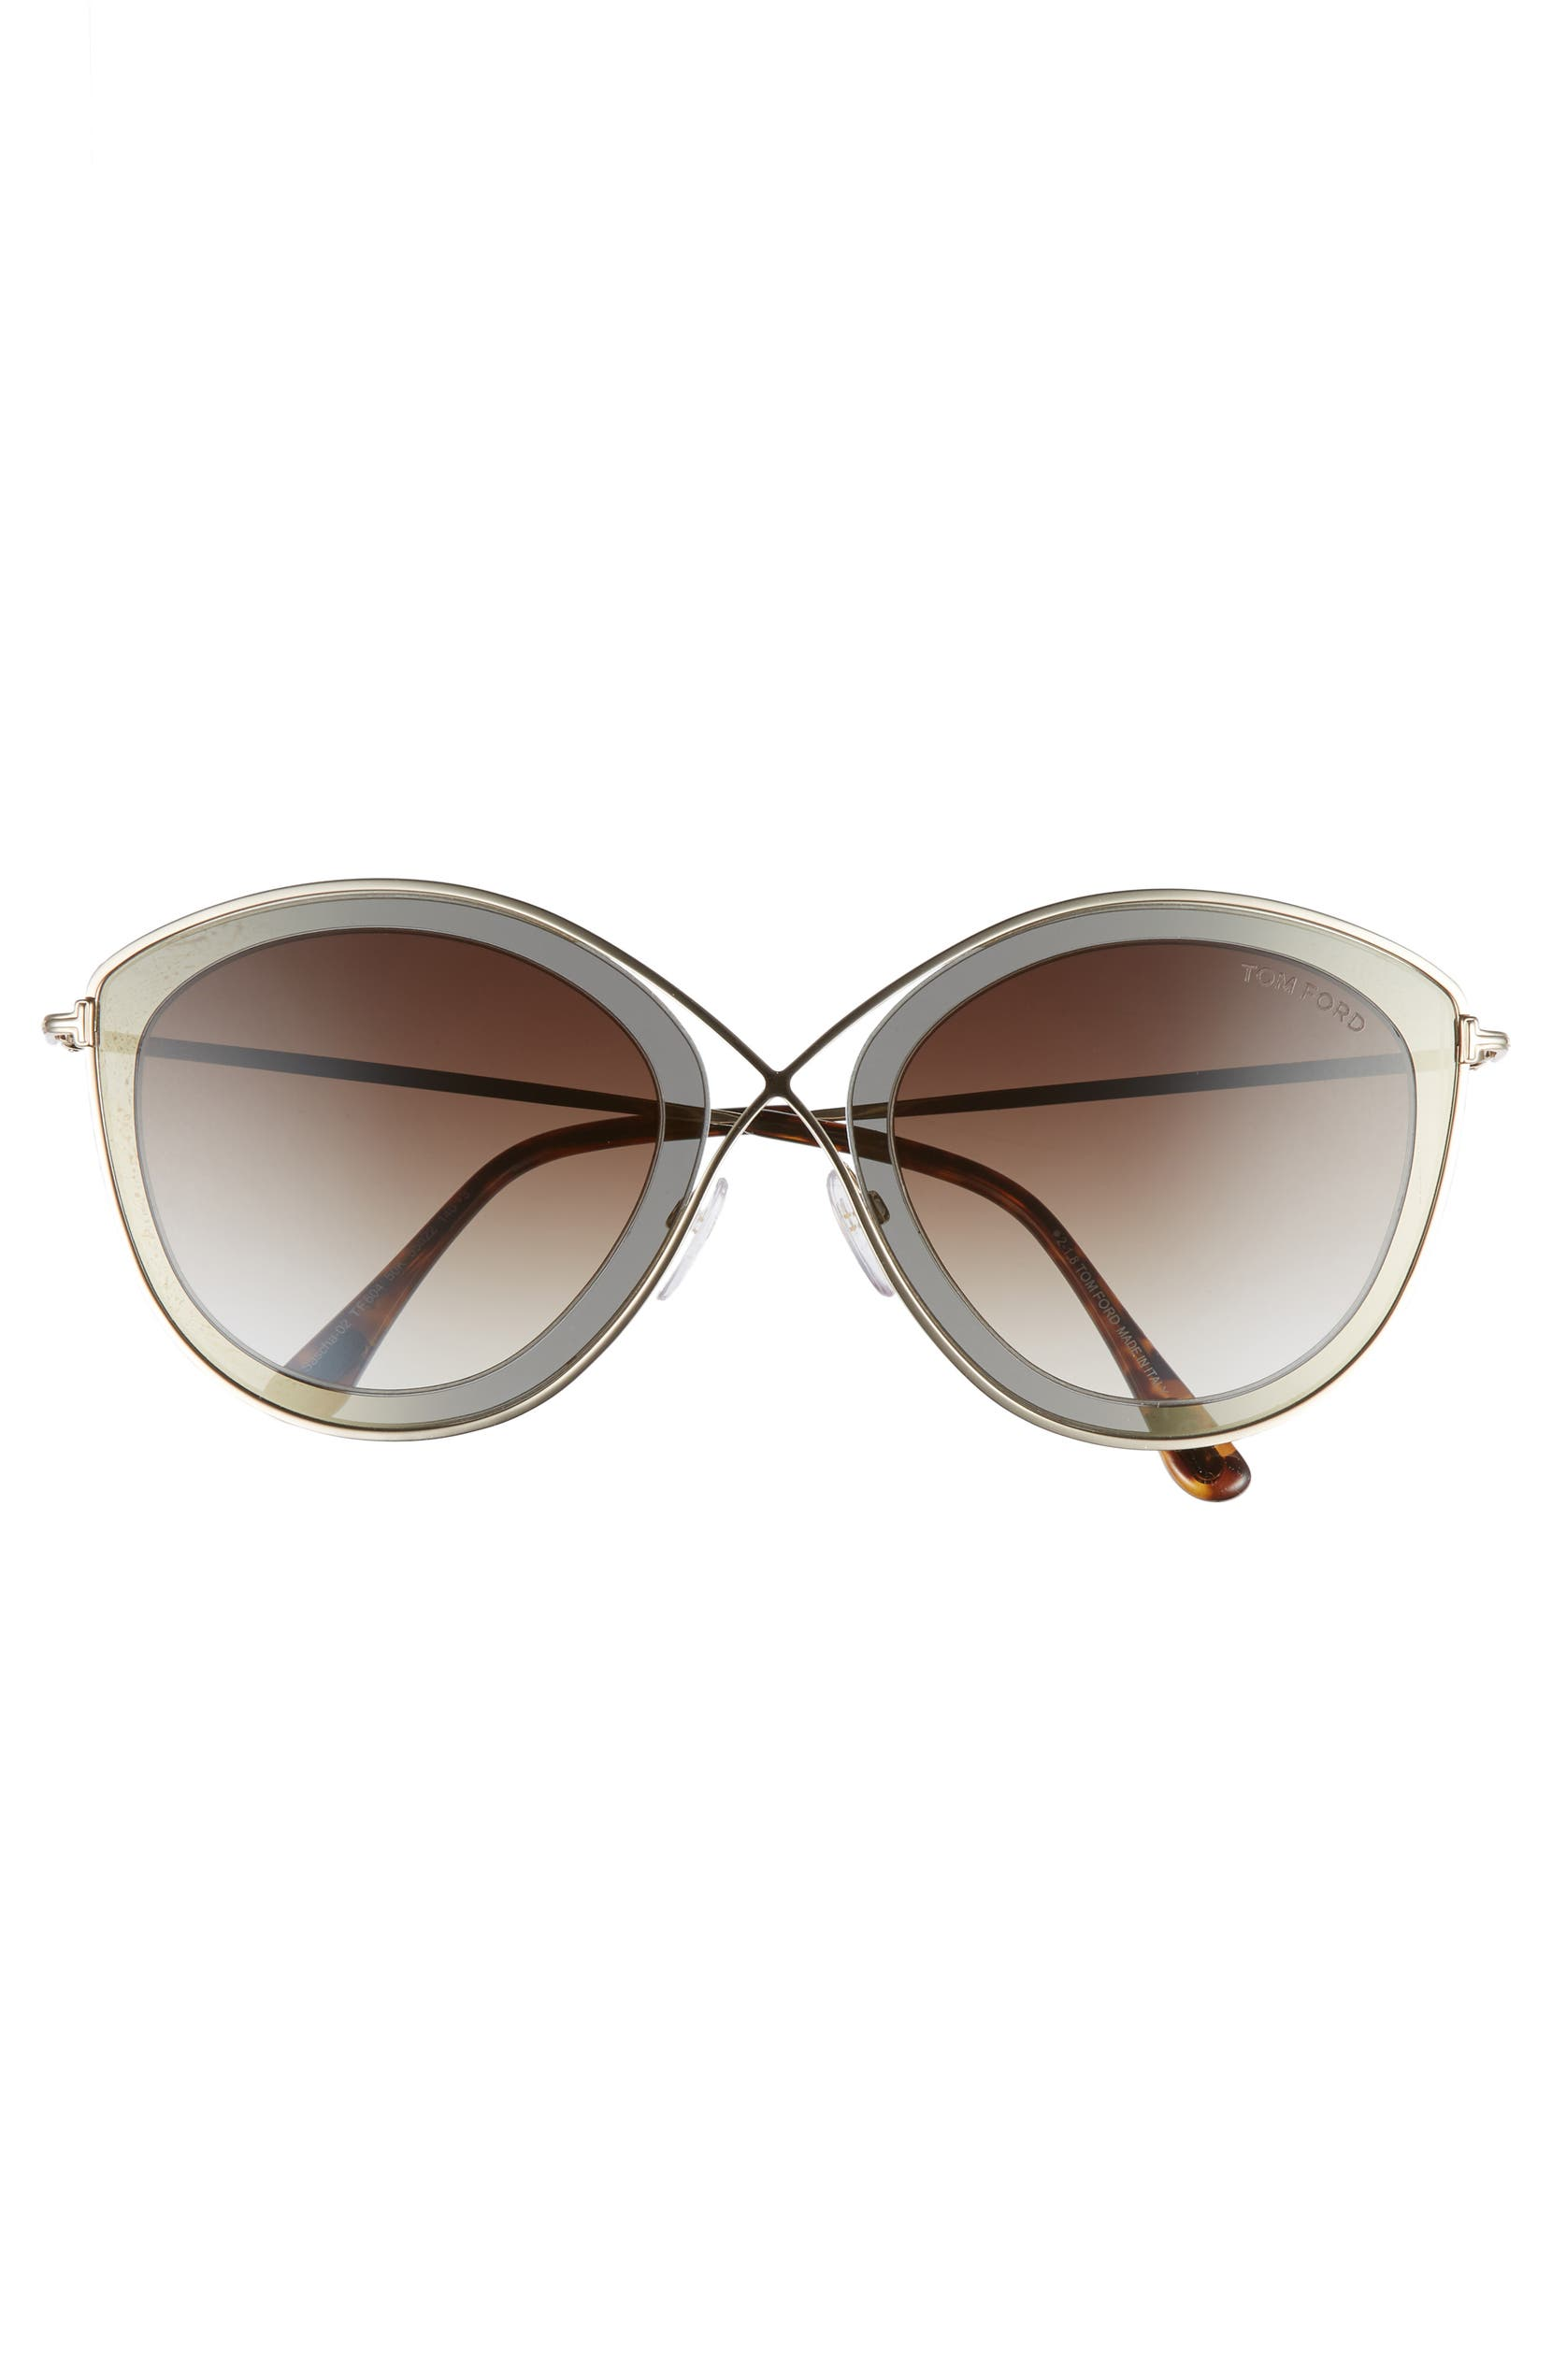 2f765cd2fe Tom Ford Sascha 55mm Butterfly Sunglasses